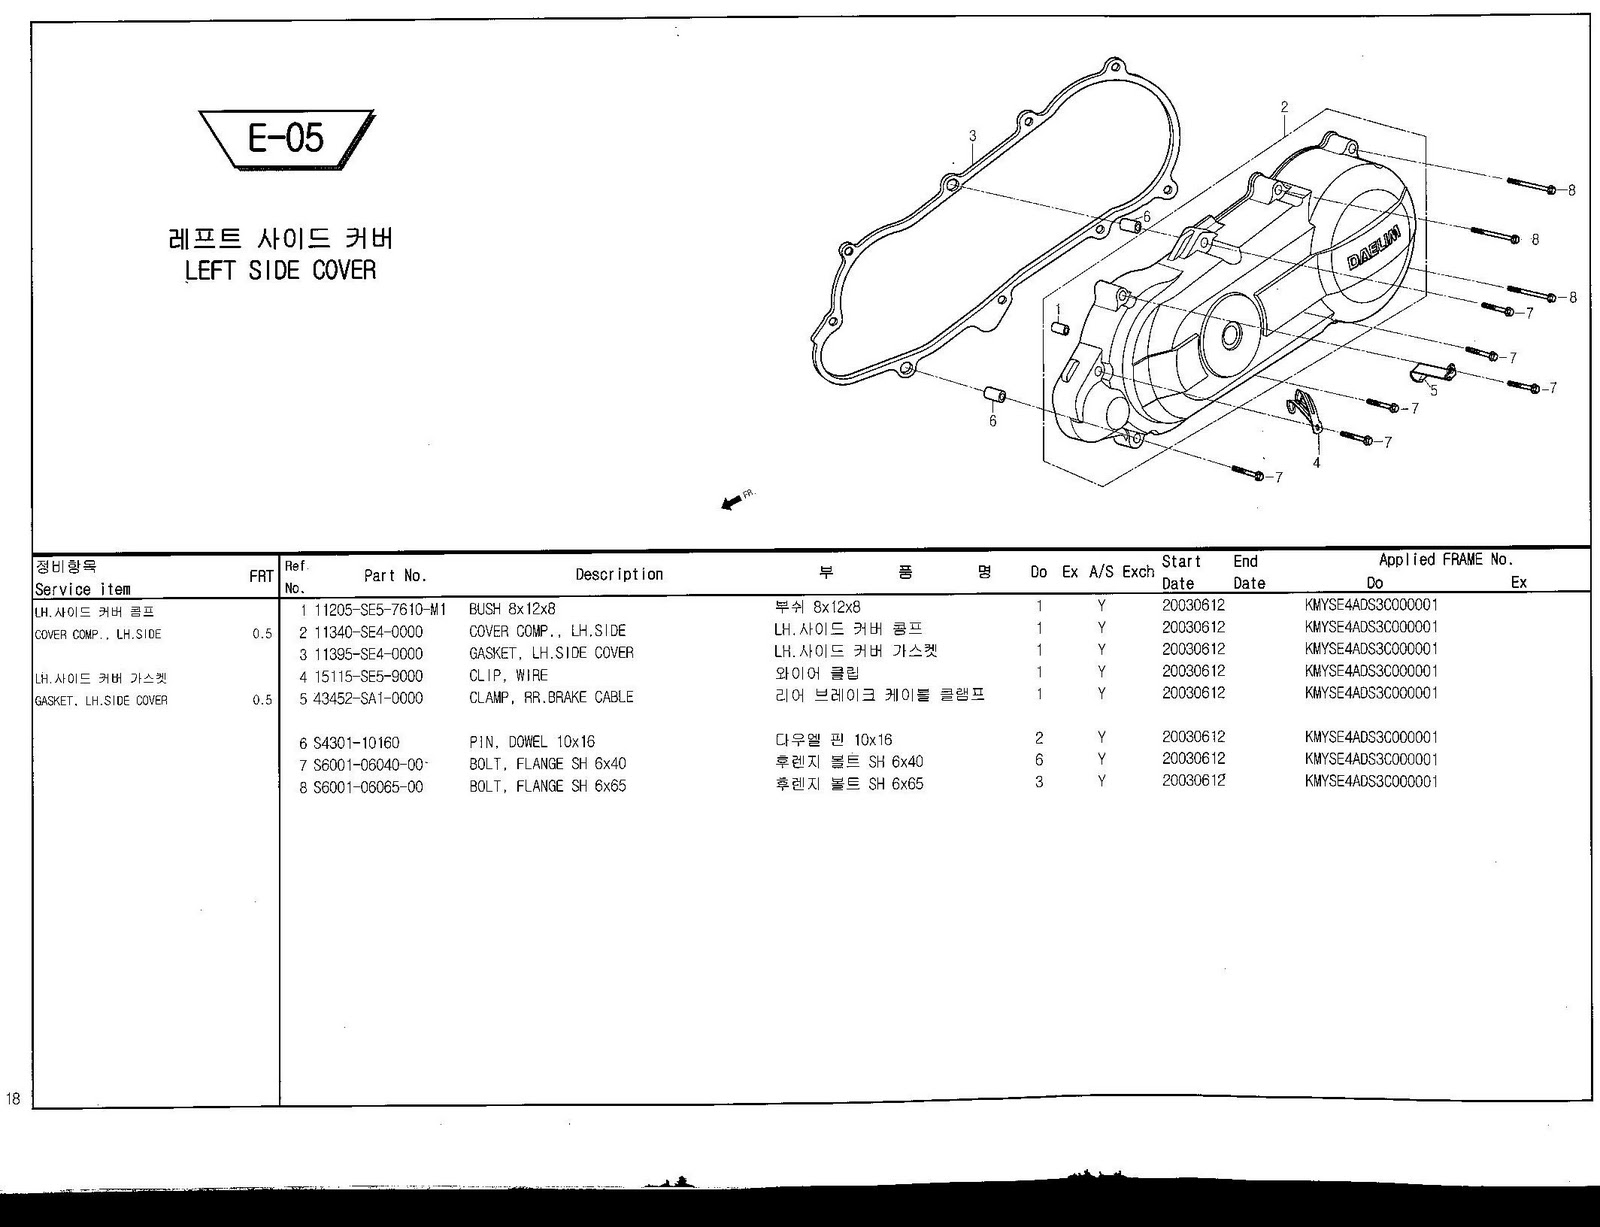 Martin Racing Performance Daelim 50cc Parts Manuals For Mrp